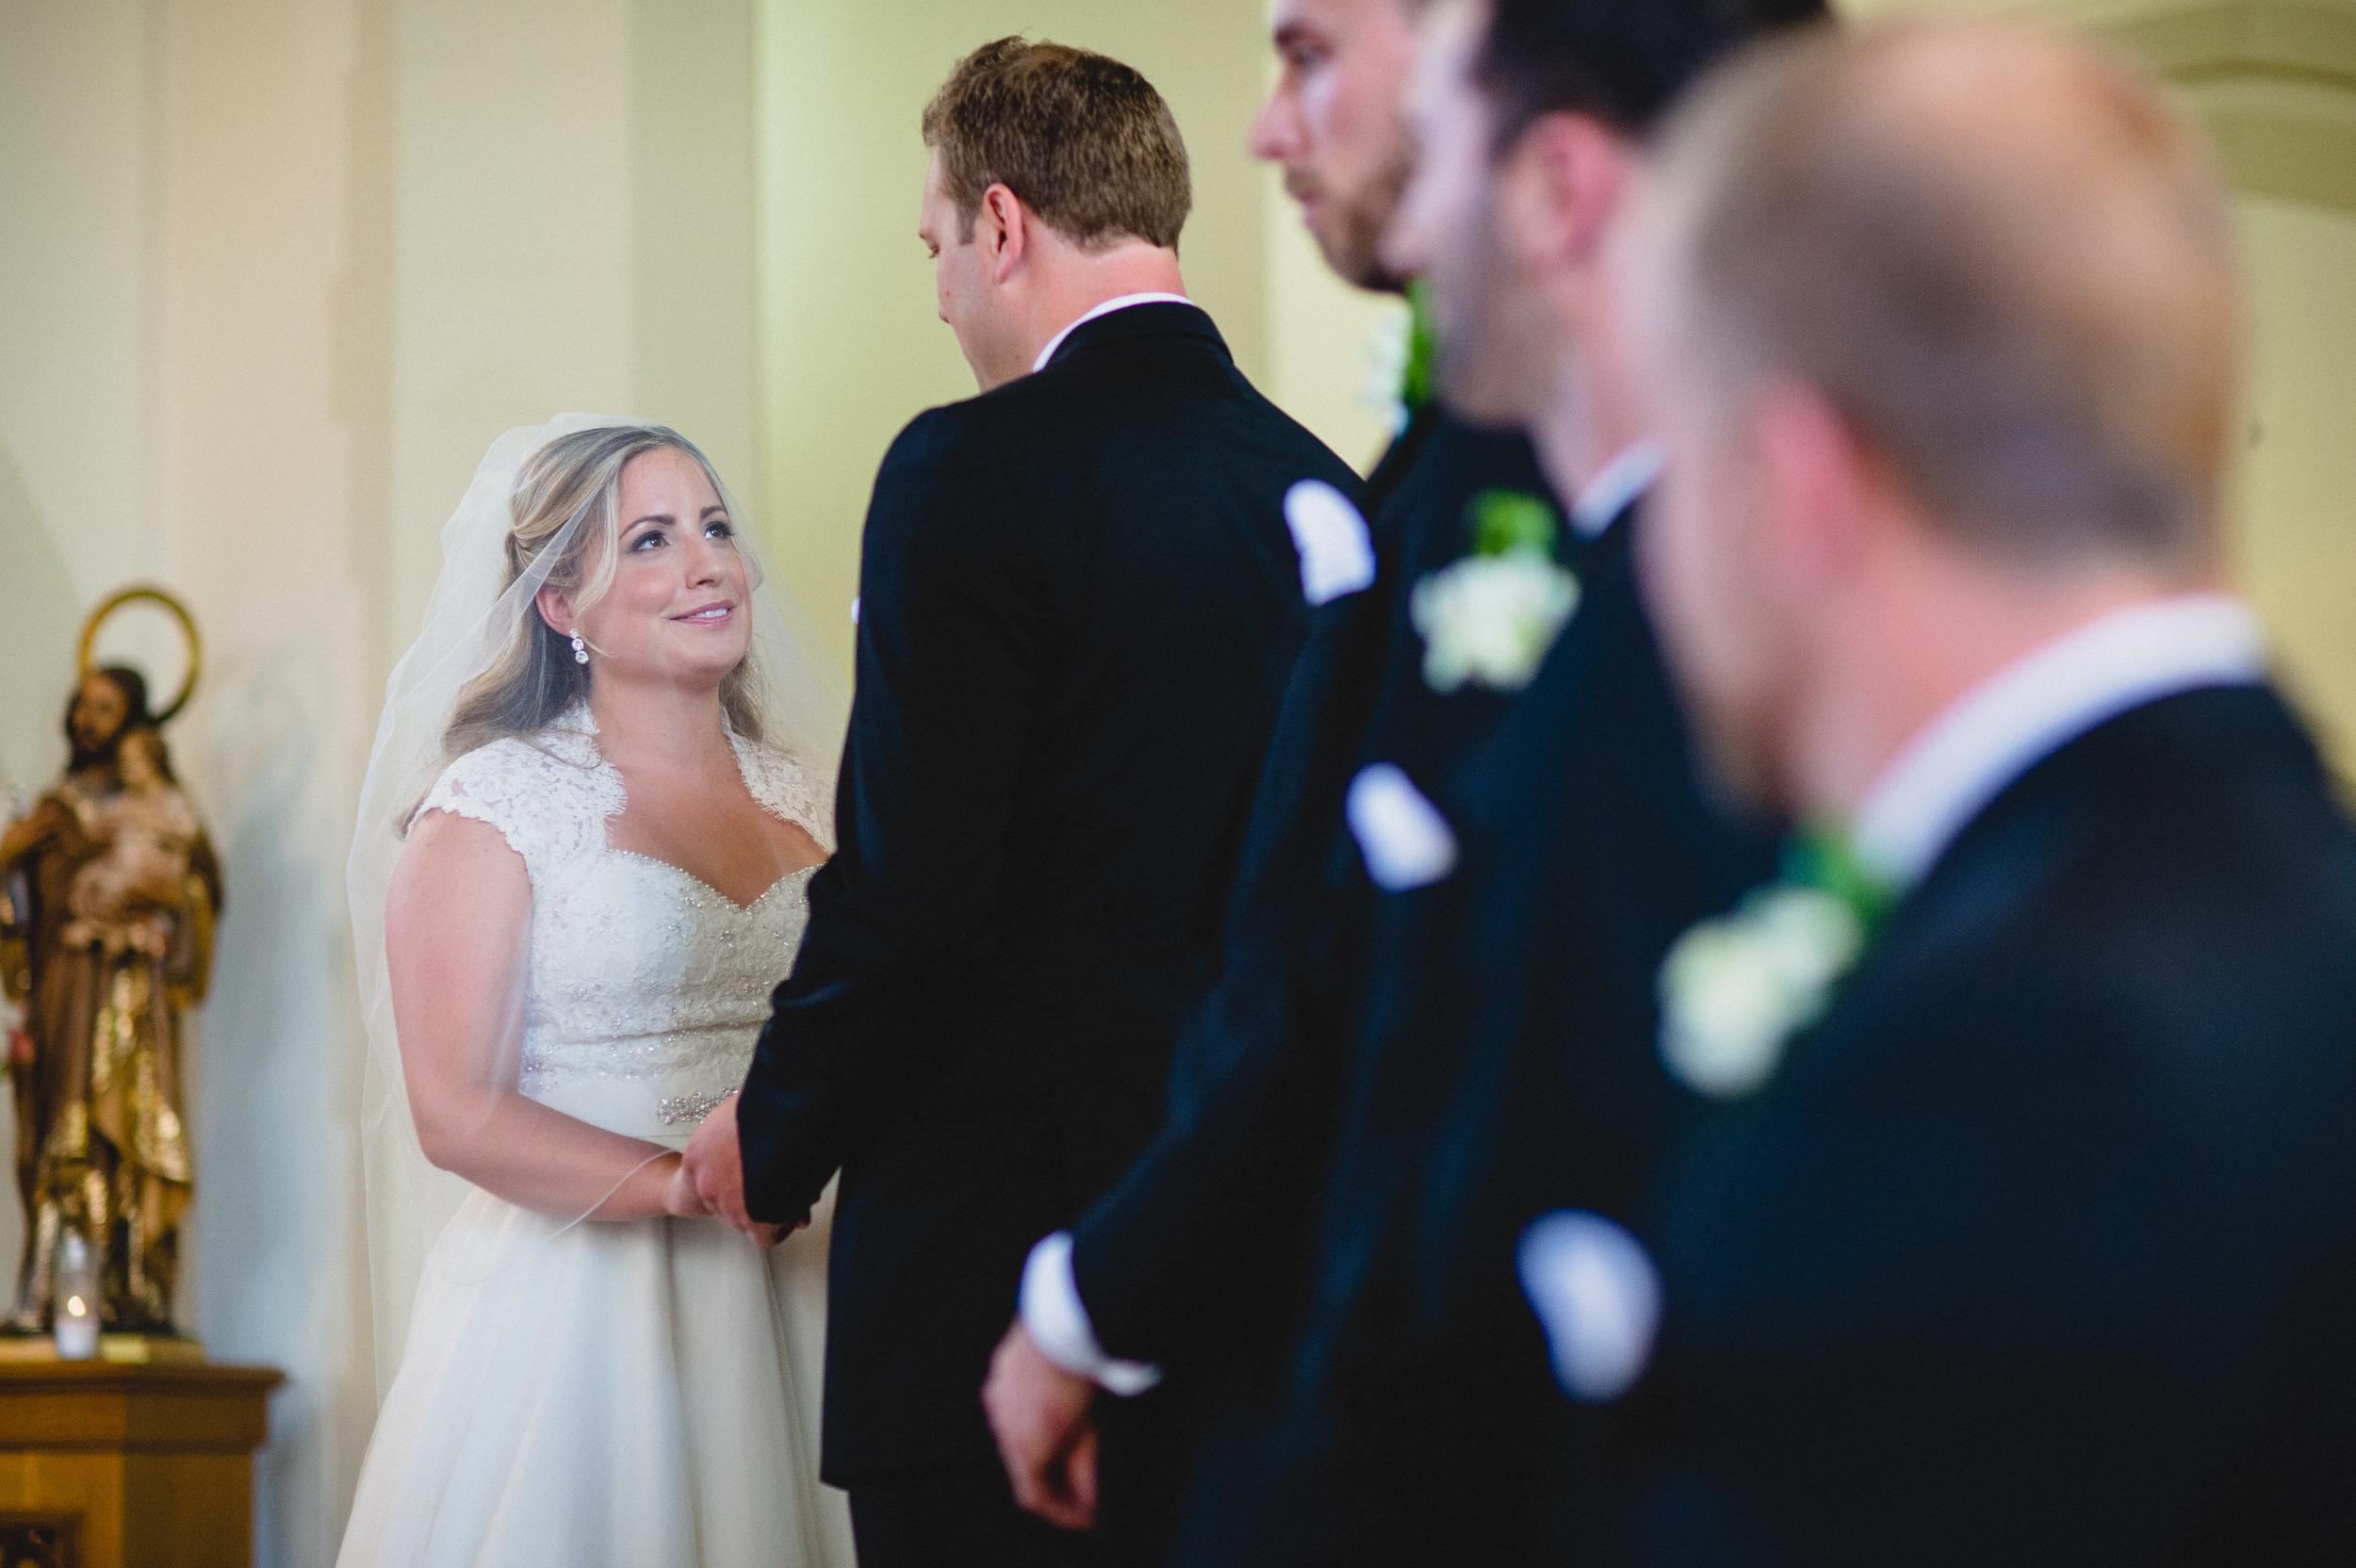 Vancouver St Augustine 's Church wedding photographer edward lai photography-44.jpg